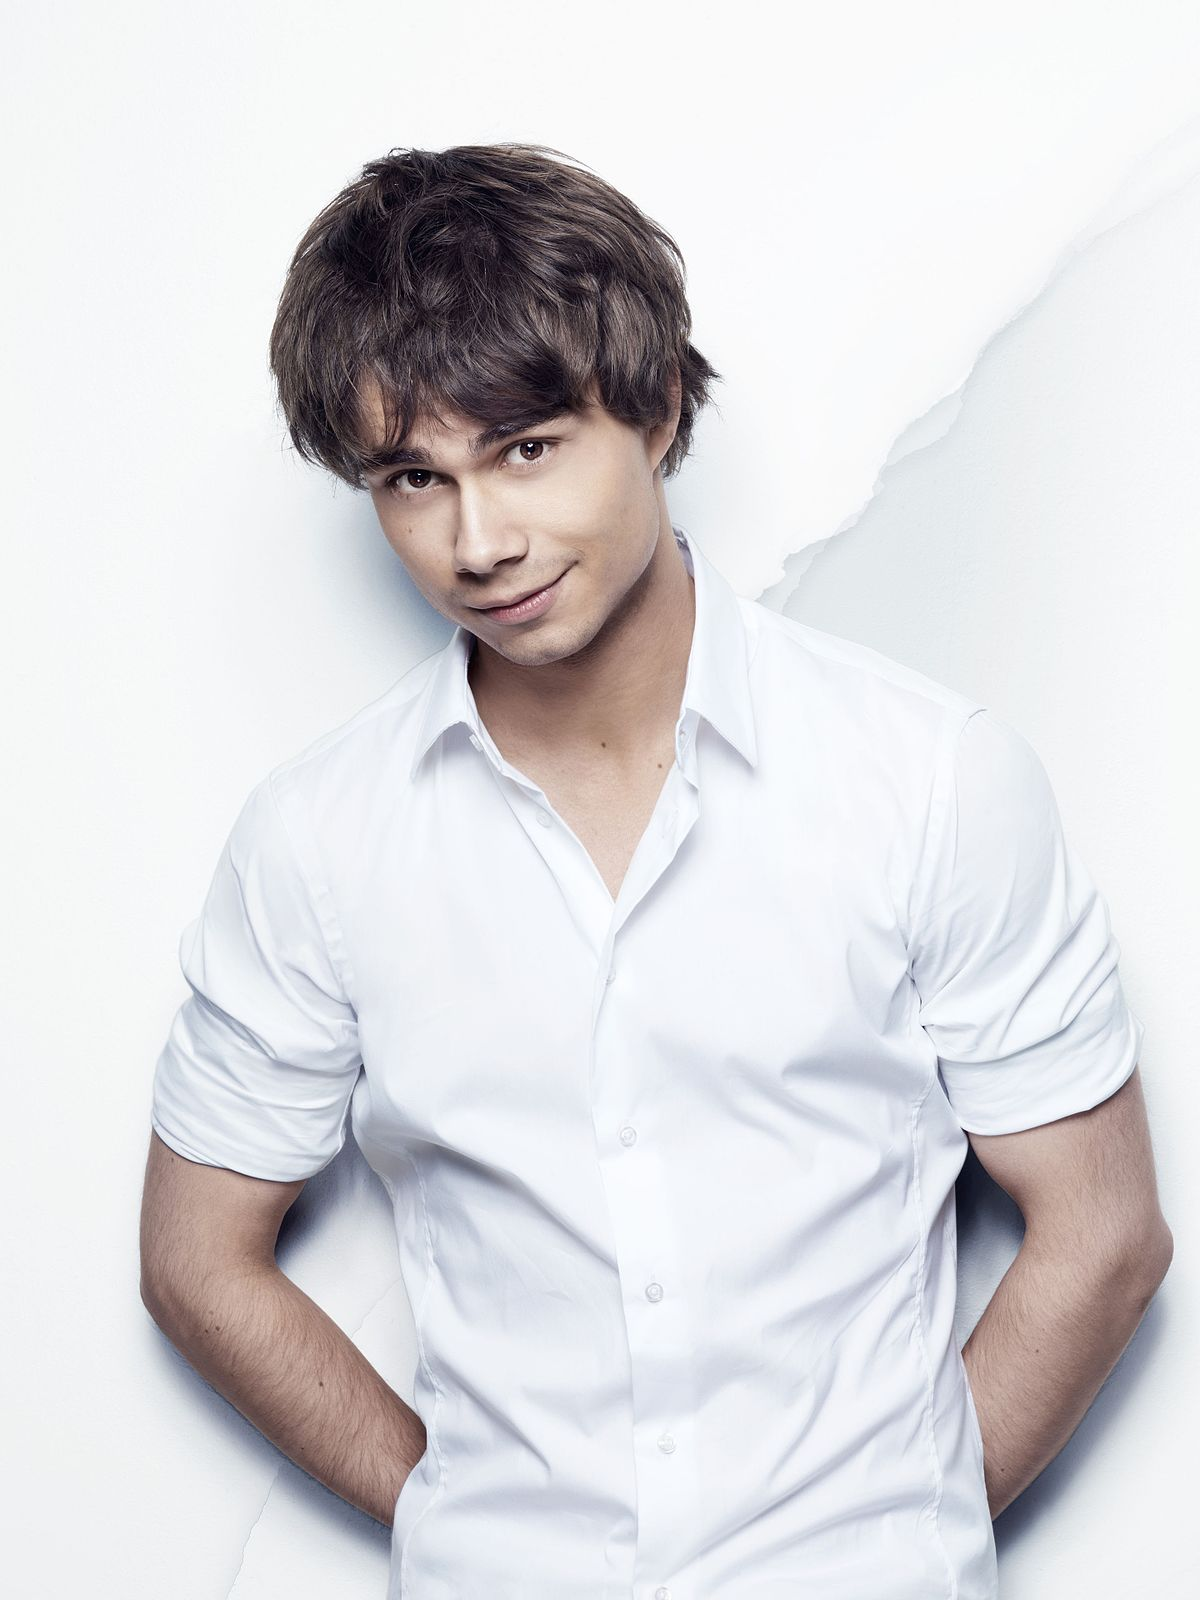 Alexander Rybak - Wikipedia